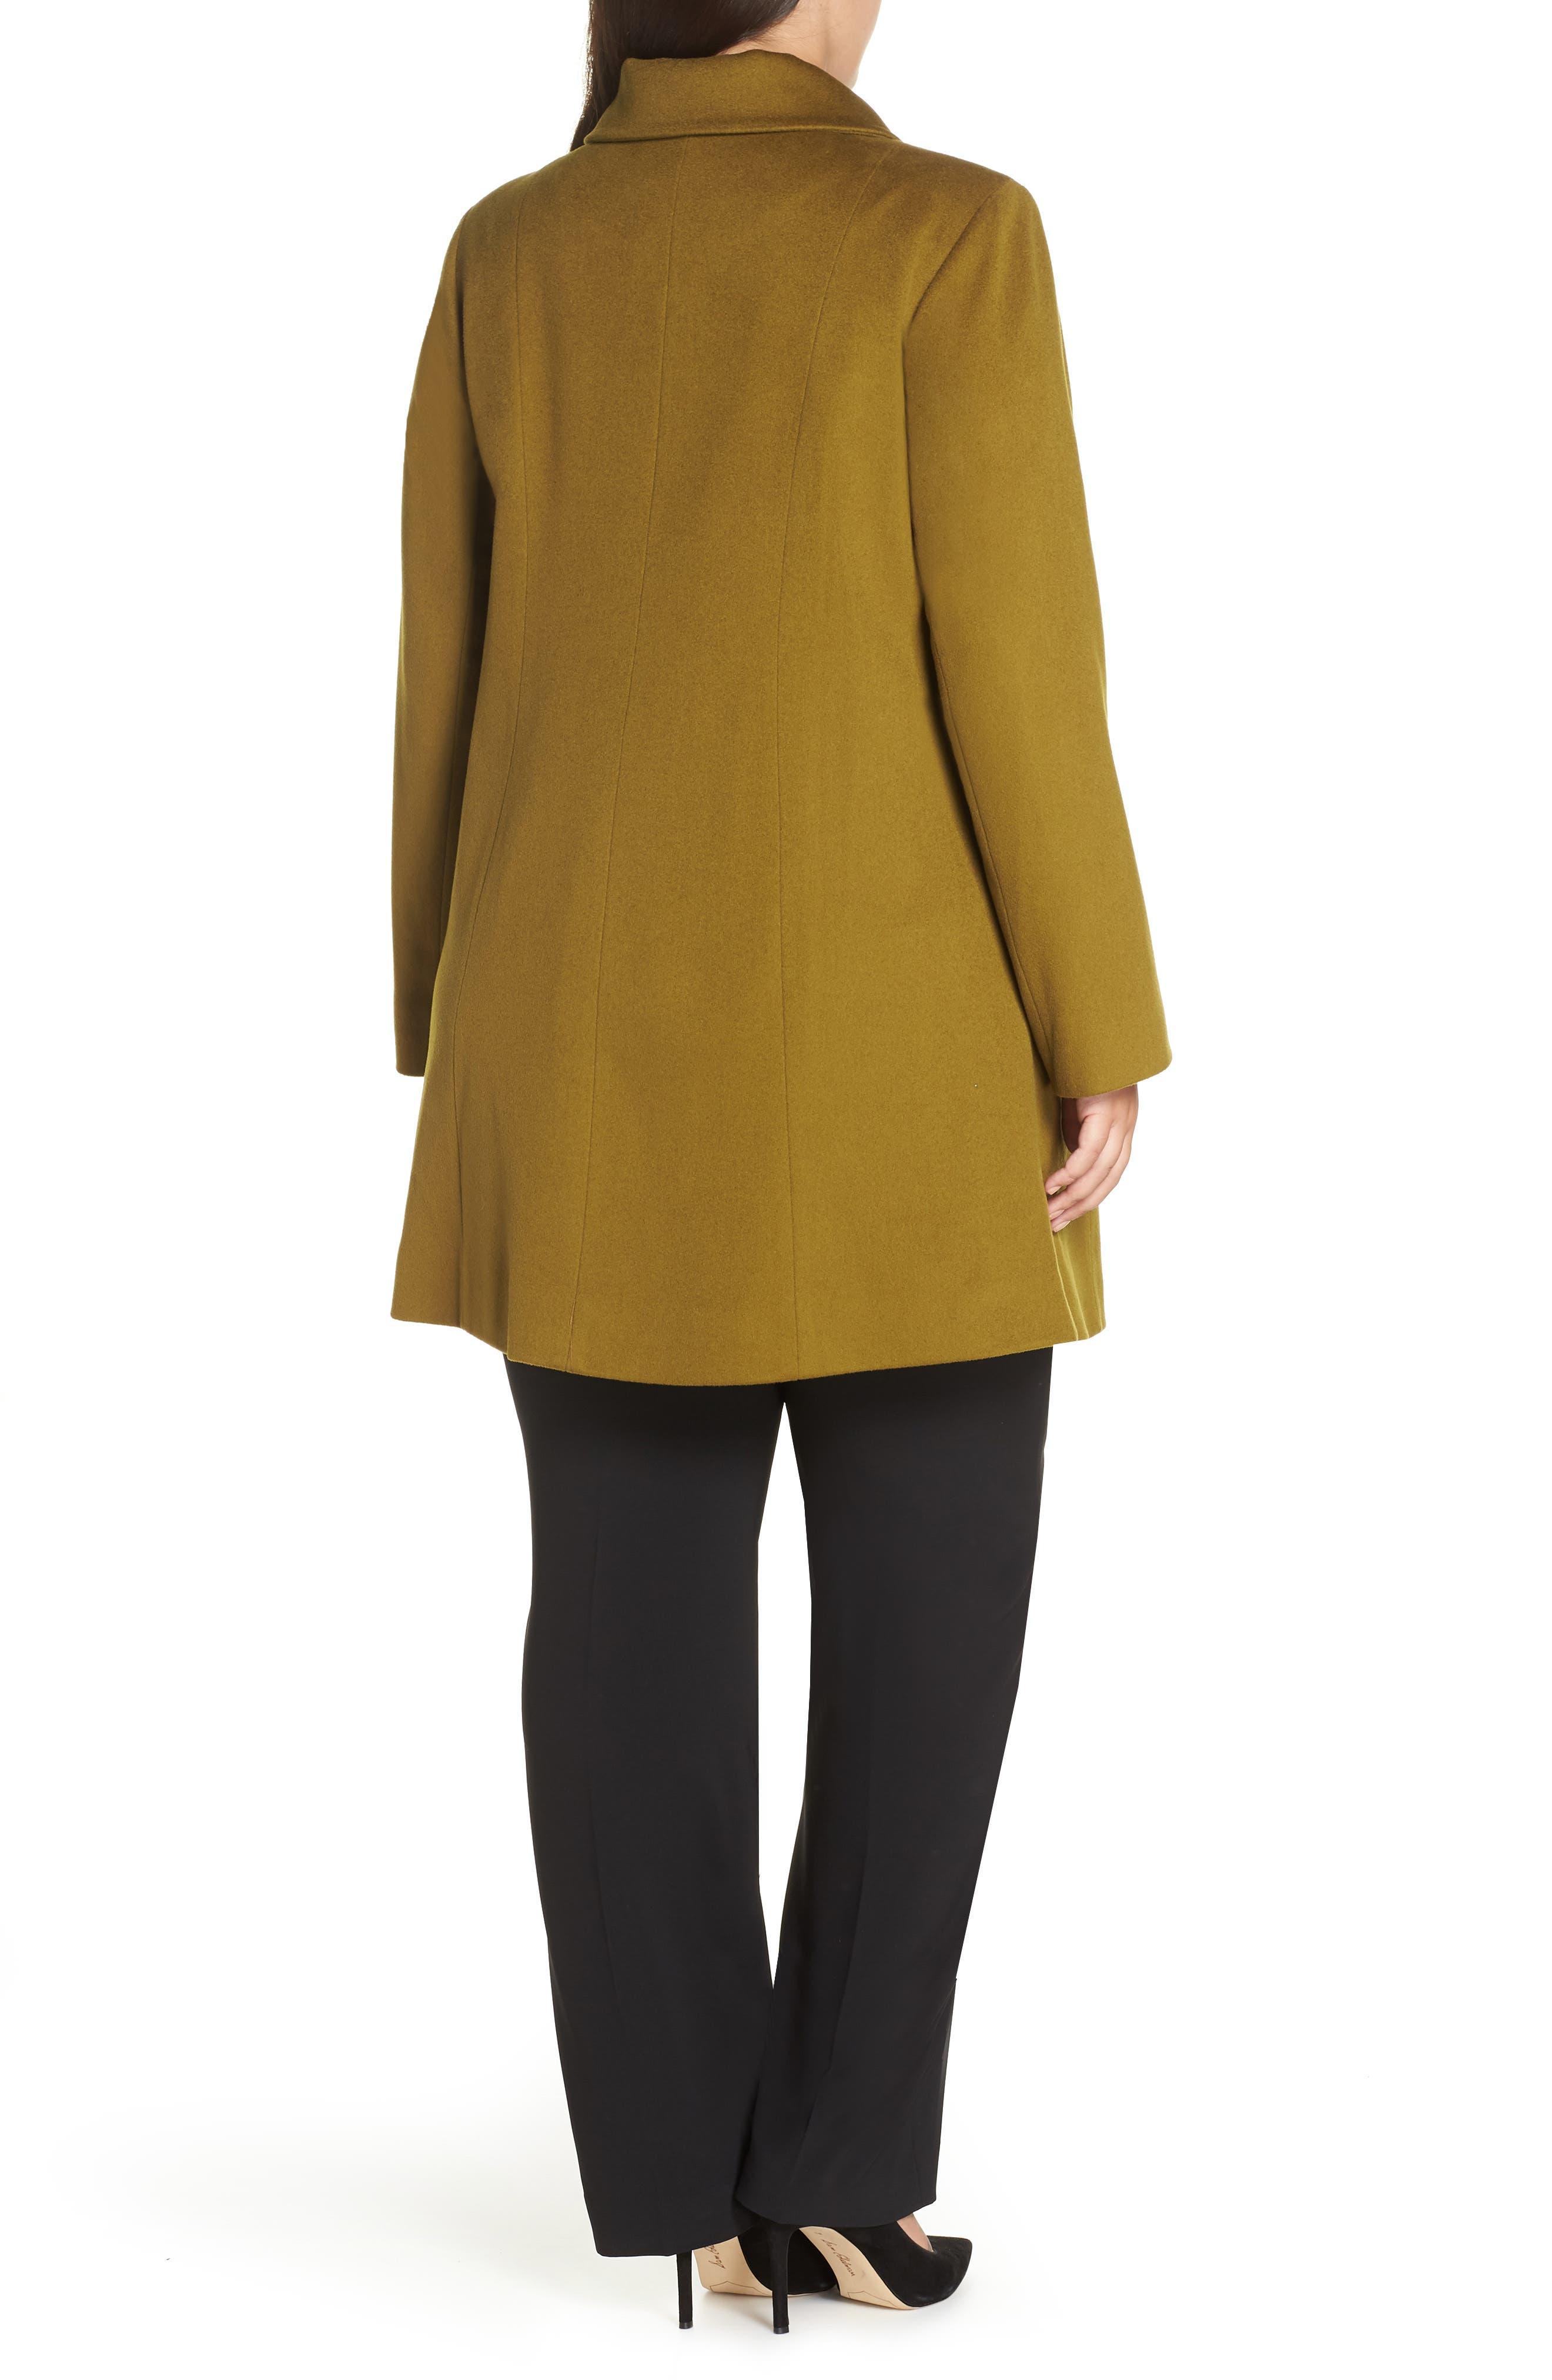 FLEURETTE,                             Loro Piana Wool Car Coat,                             Alternate thumbnail 2, color,                             305